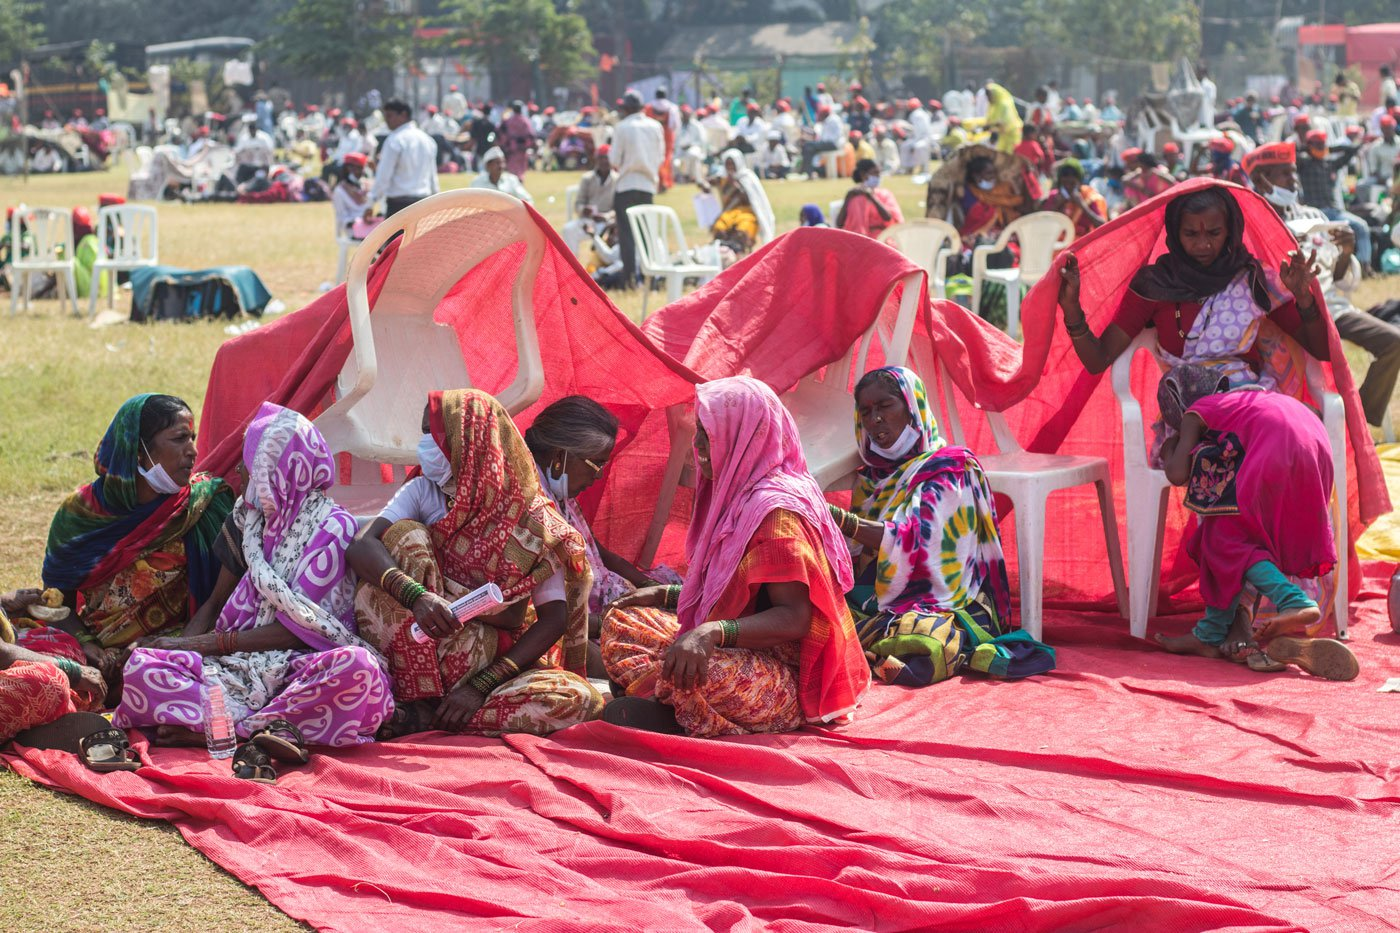 Women farmers protesting against New farm bill